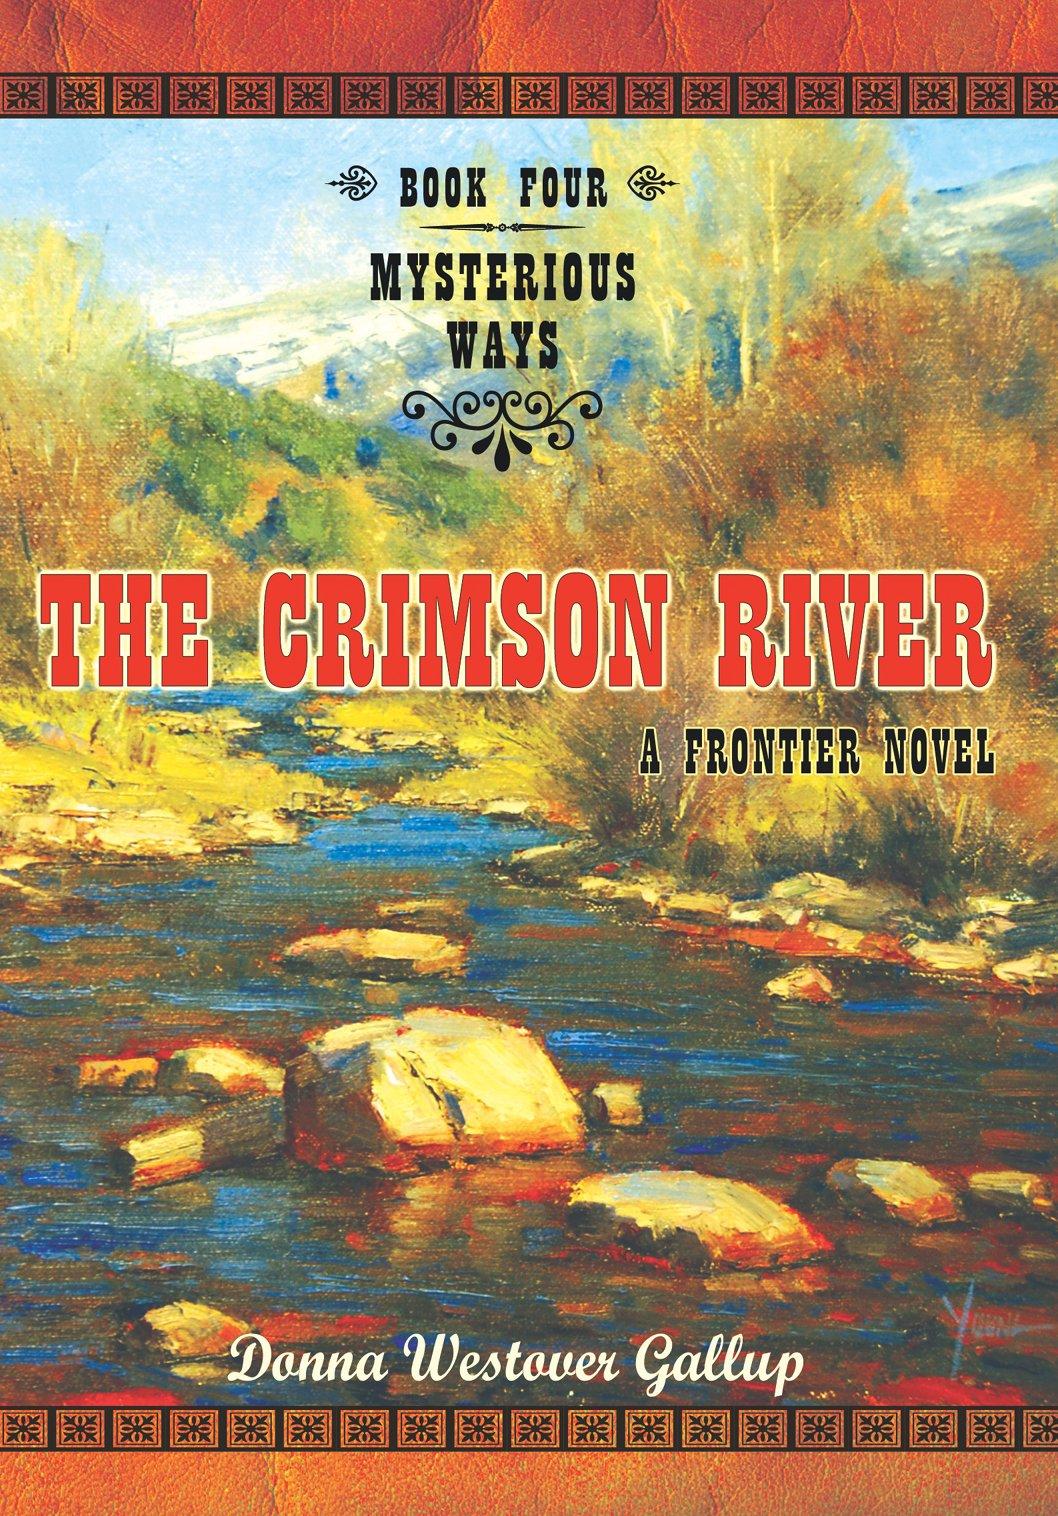 The Crimson River : A Frontier Novel (Mysterious Ways #4)